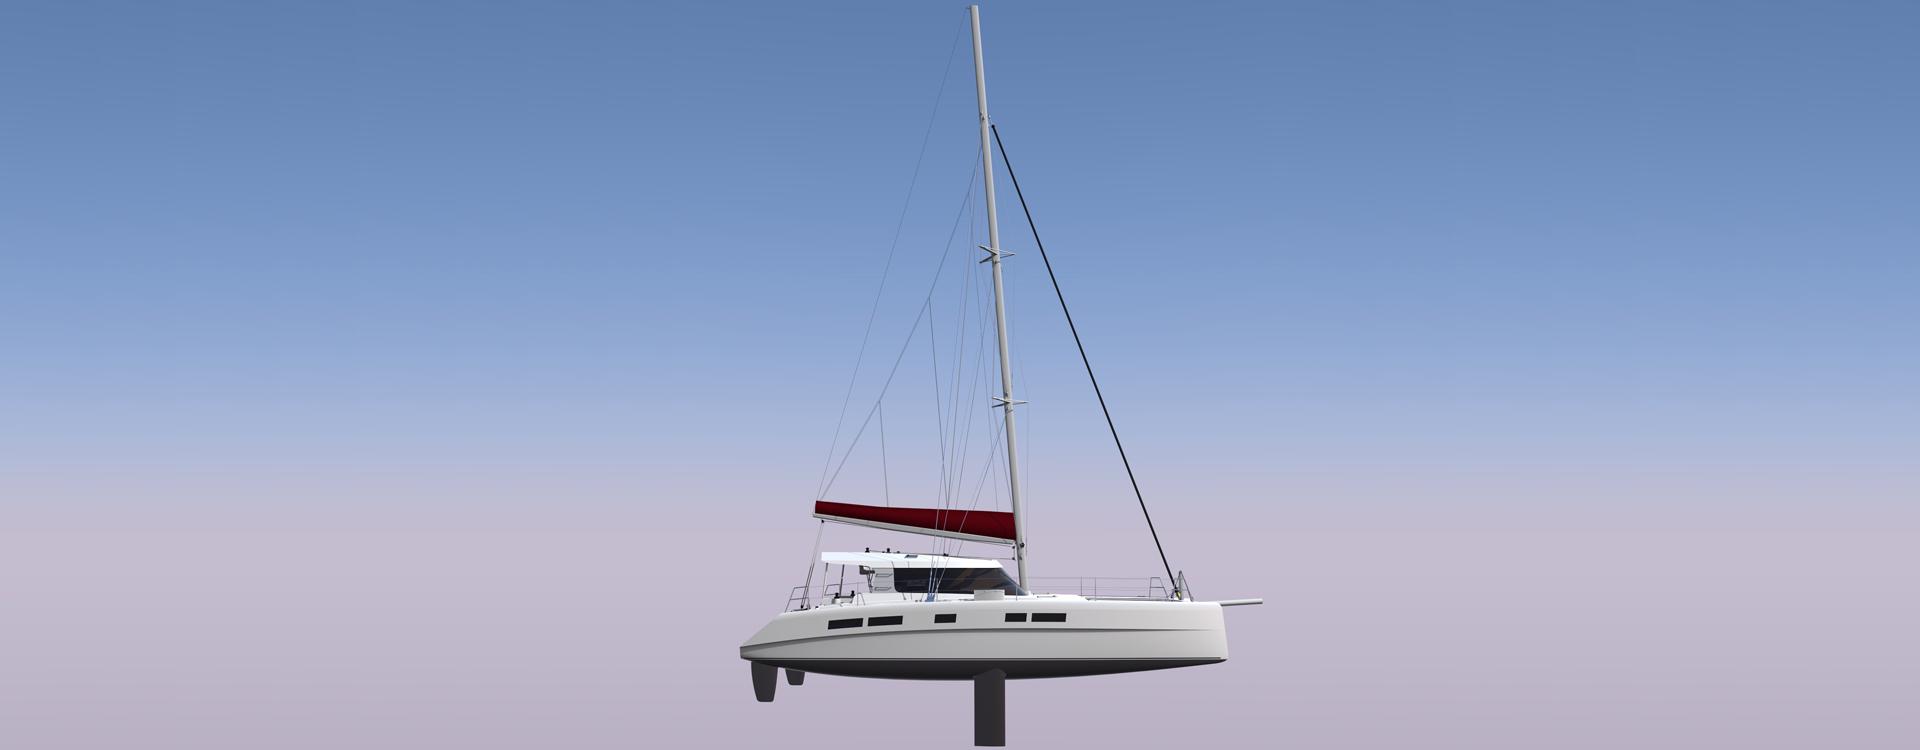 catamaran de croisiere, multicoque, voilier regate